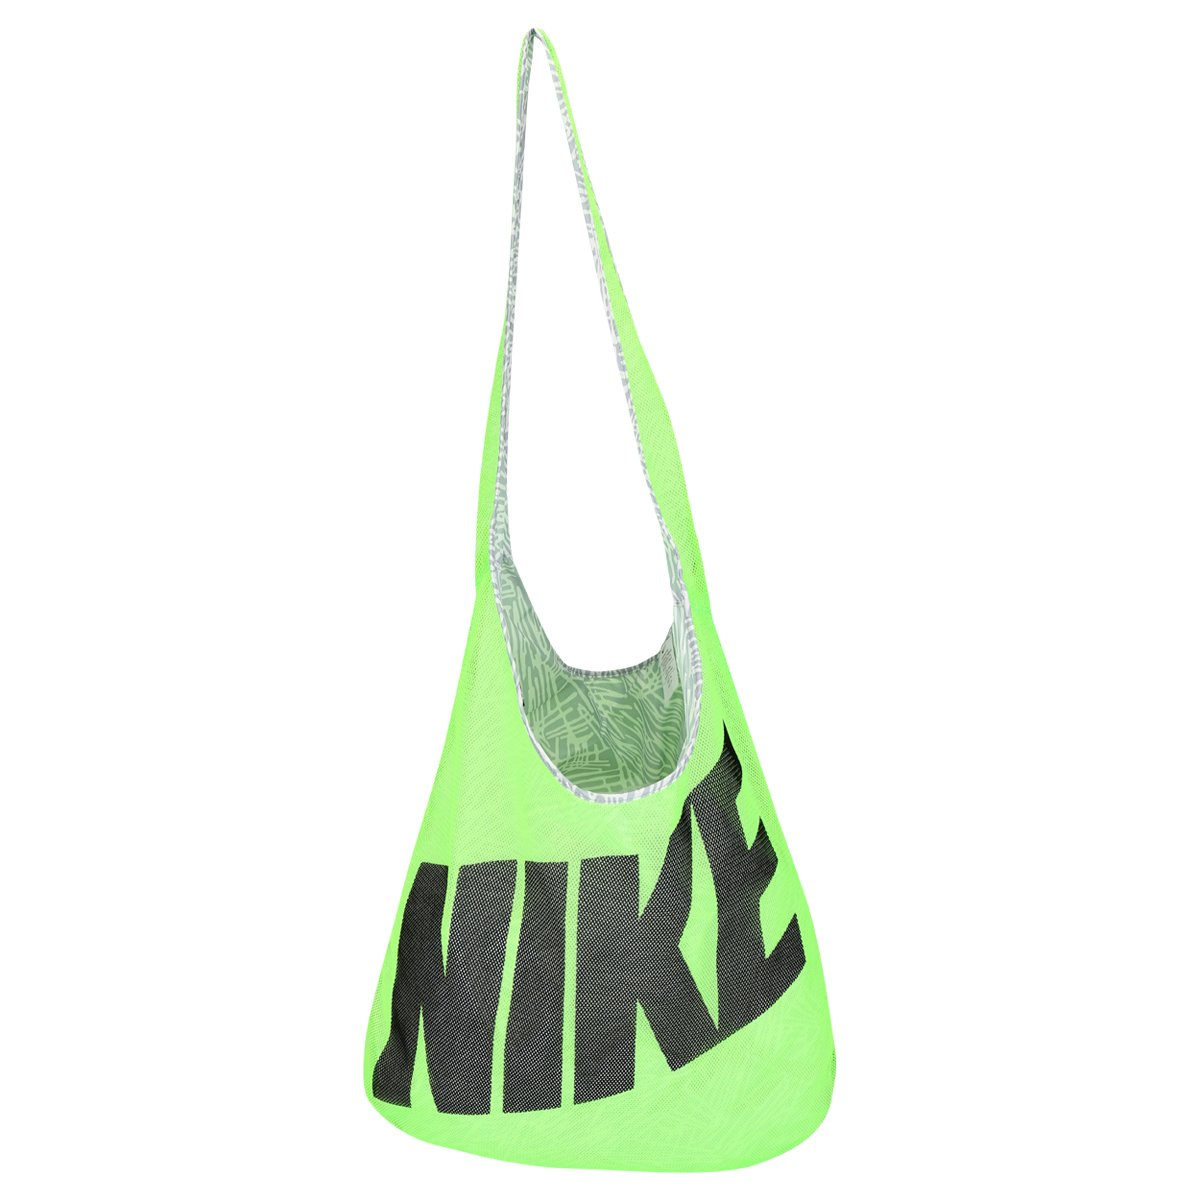 Reversible Compre Nike Agoranetshoes Bolsa Graphic 5a4rjl Feminina wnO0PX8k